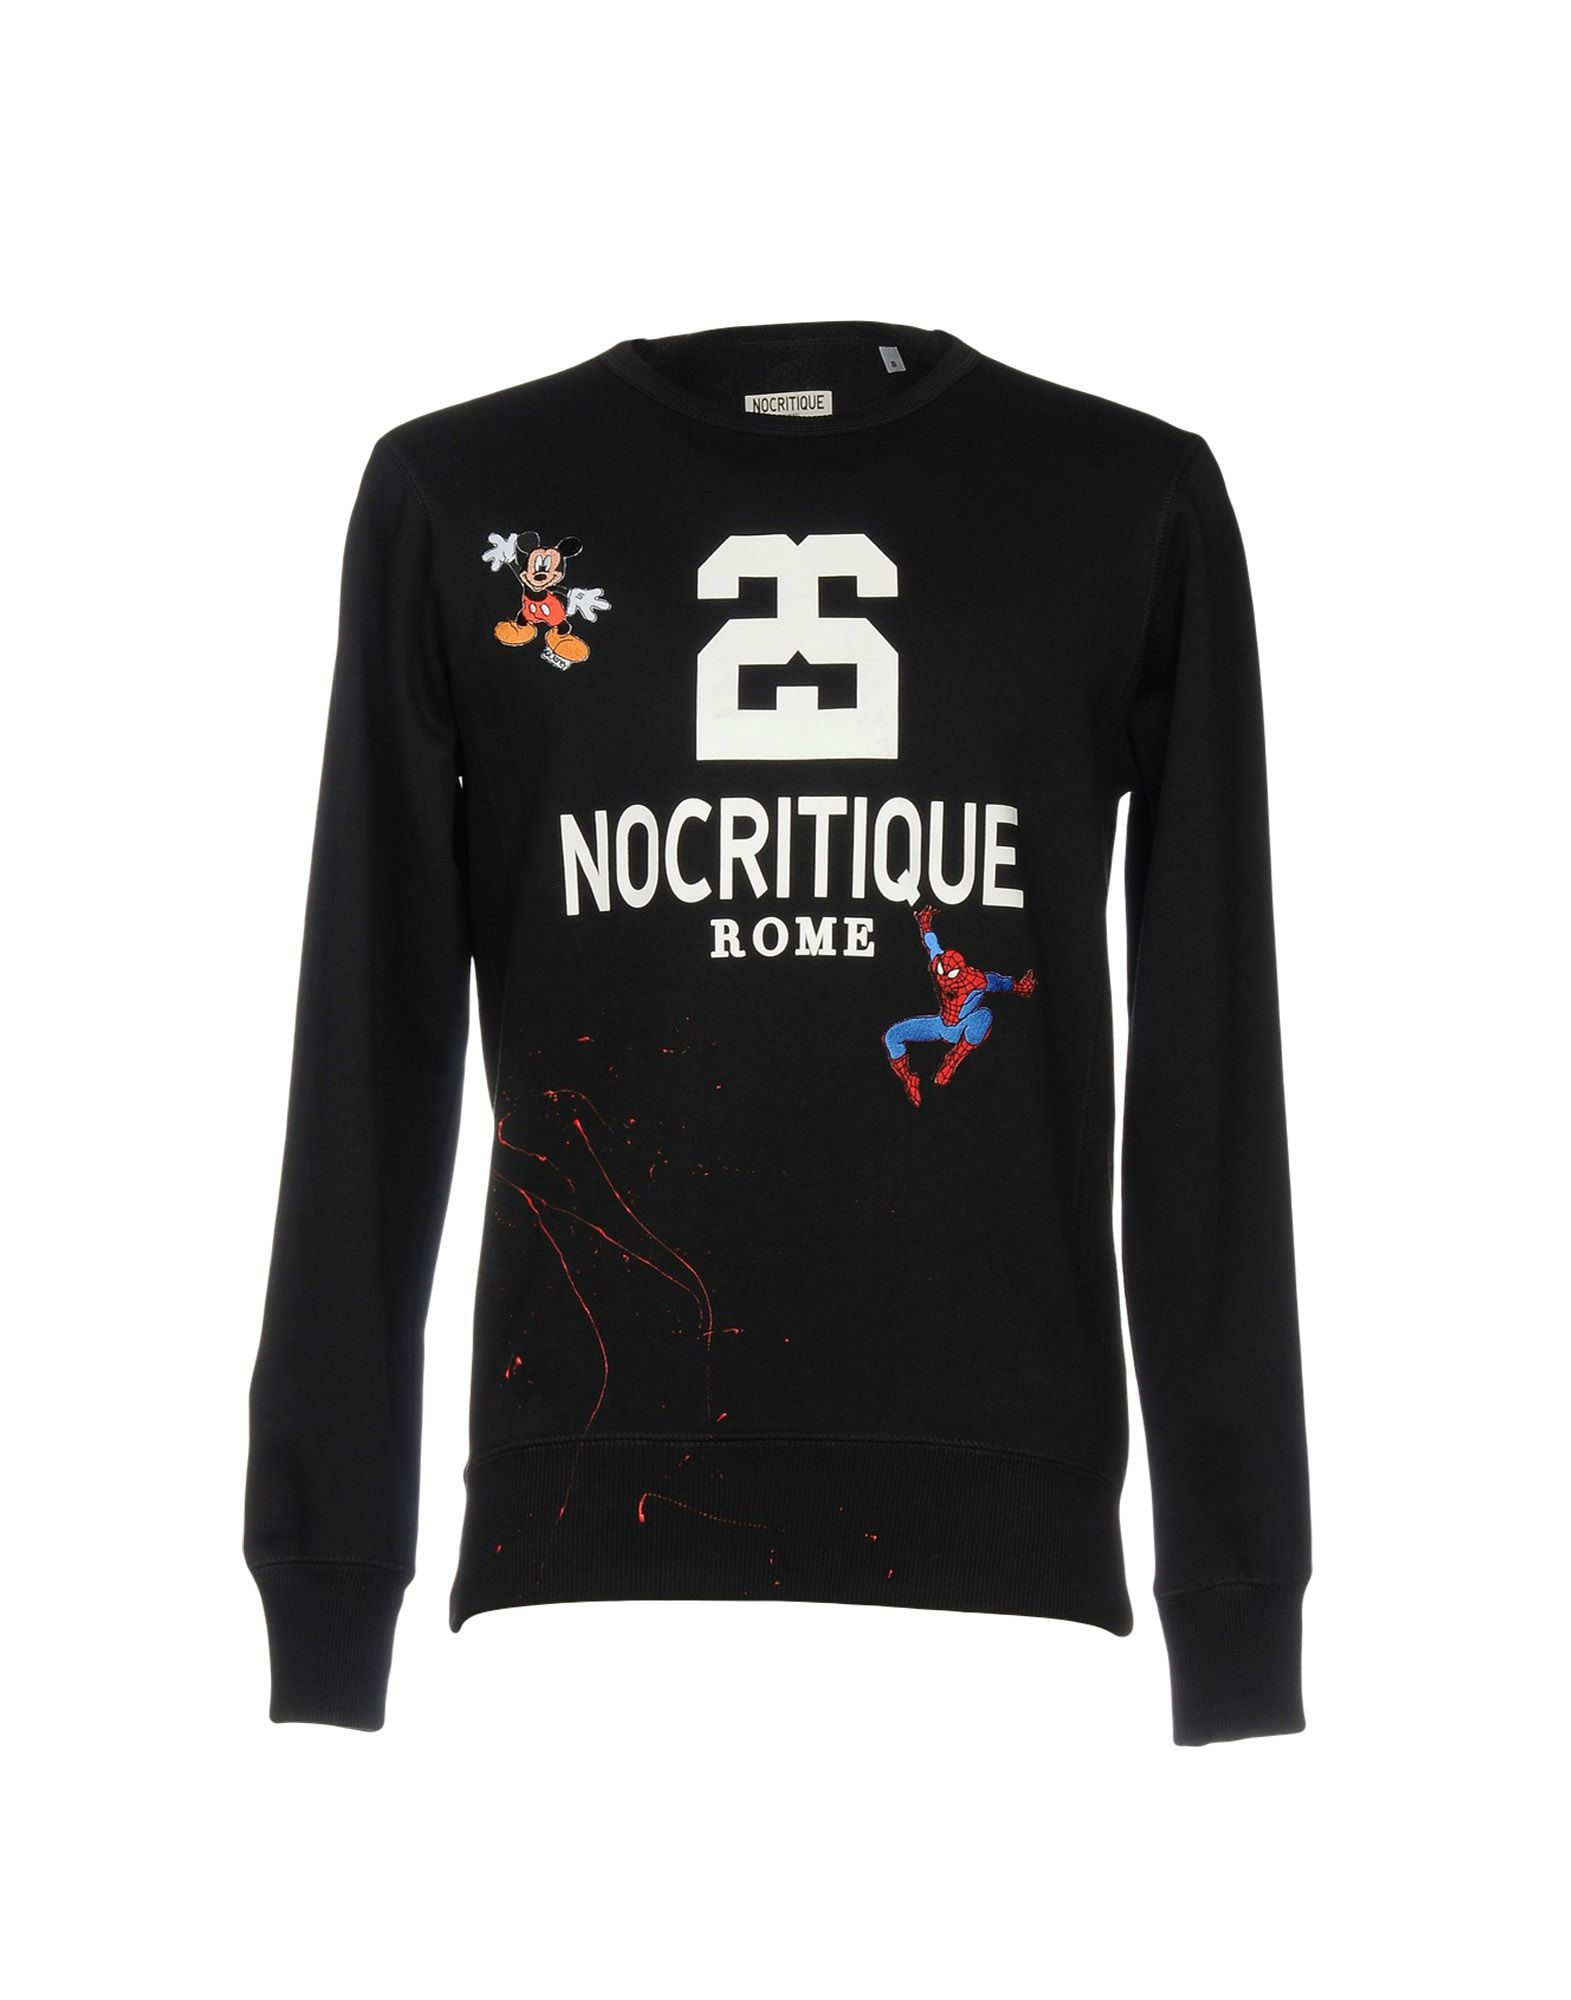 'NO CRITIQUE Rome Sweatshirts